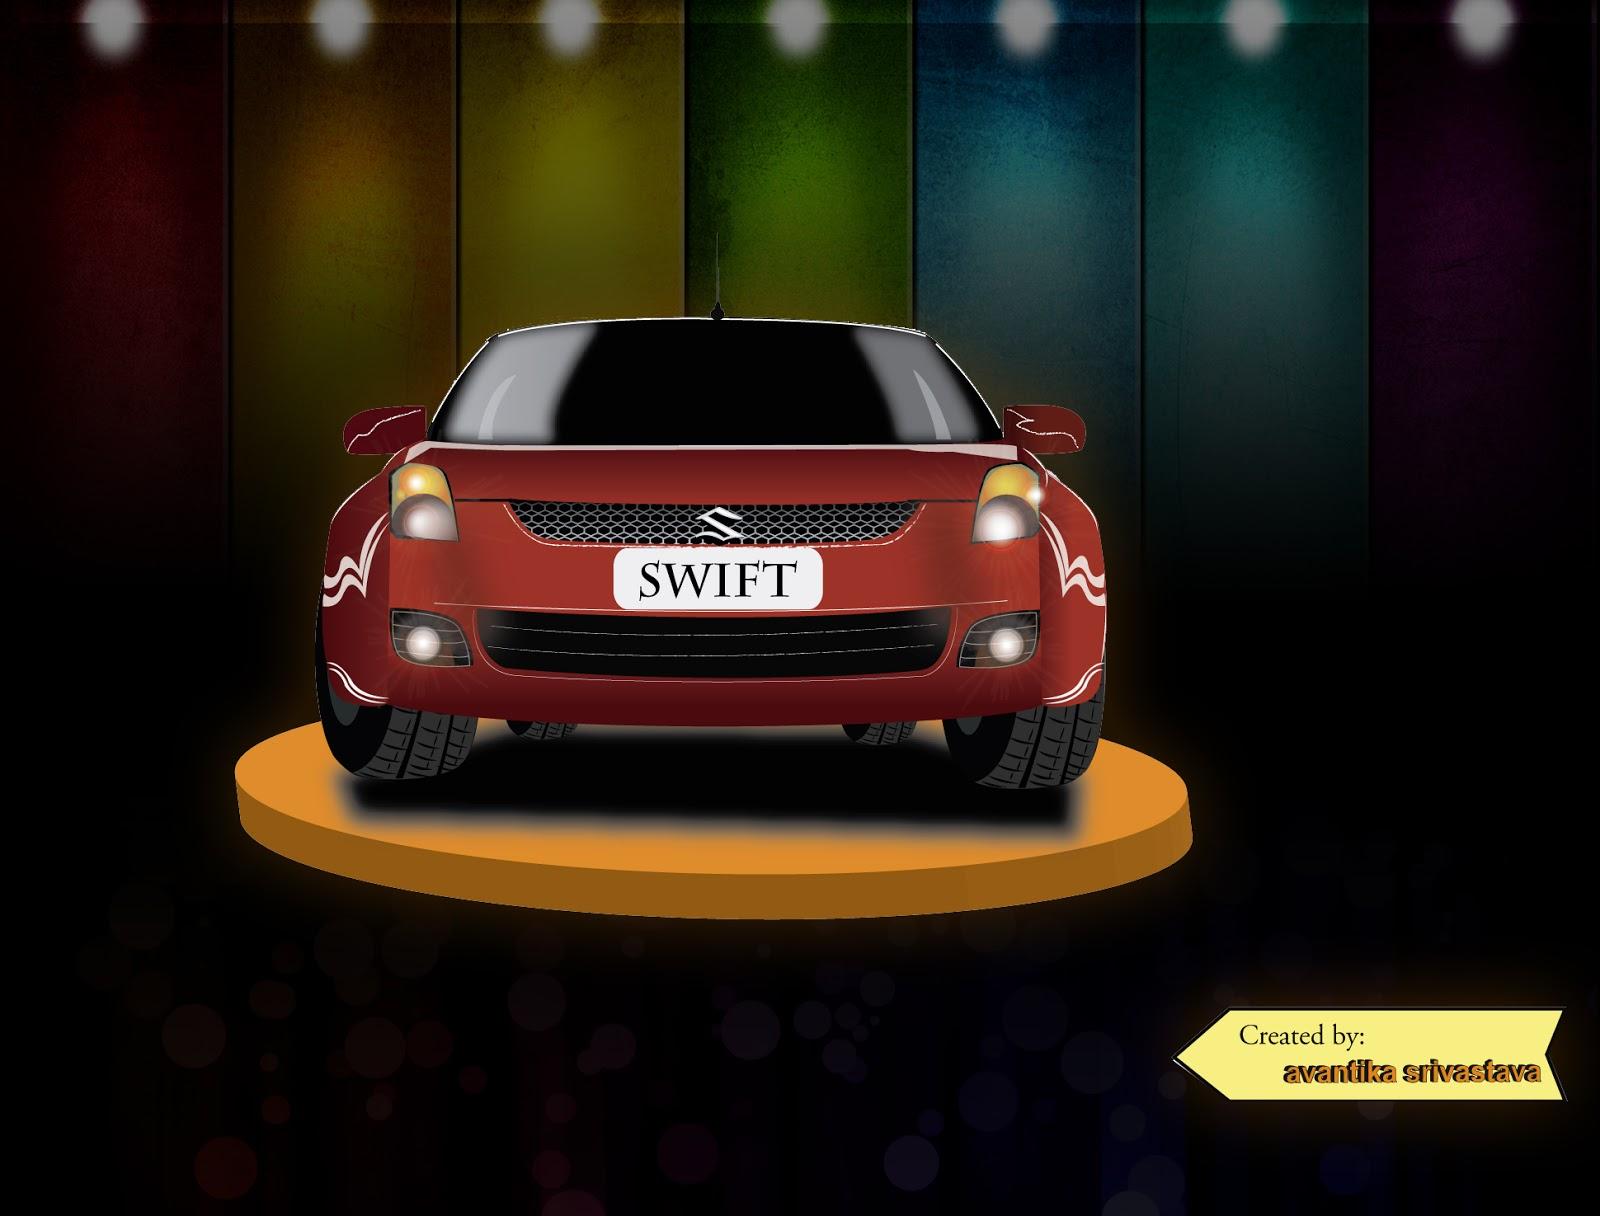 Galaxy Design Quot Swift Quot Car On Illustrator